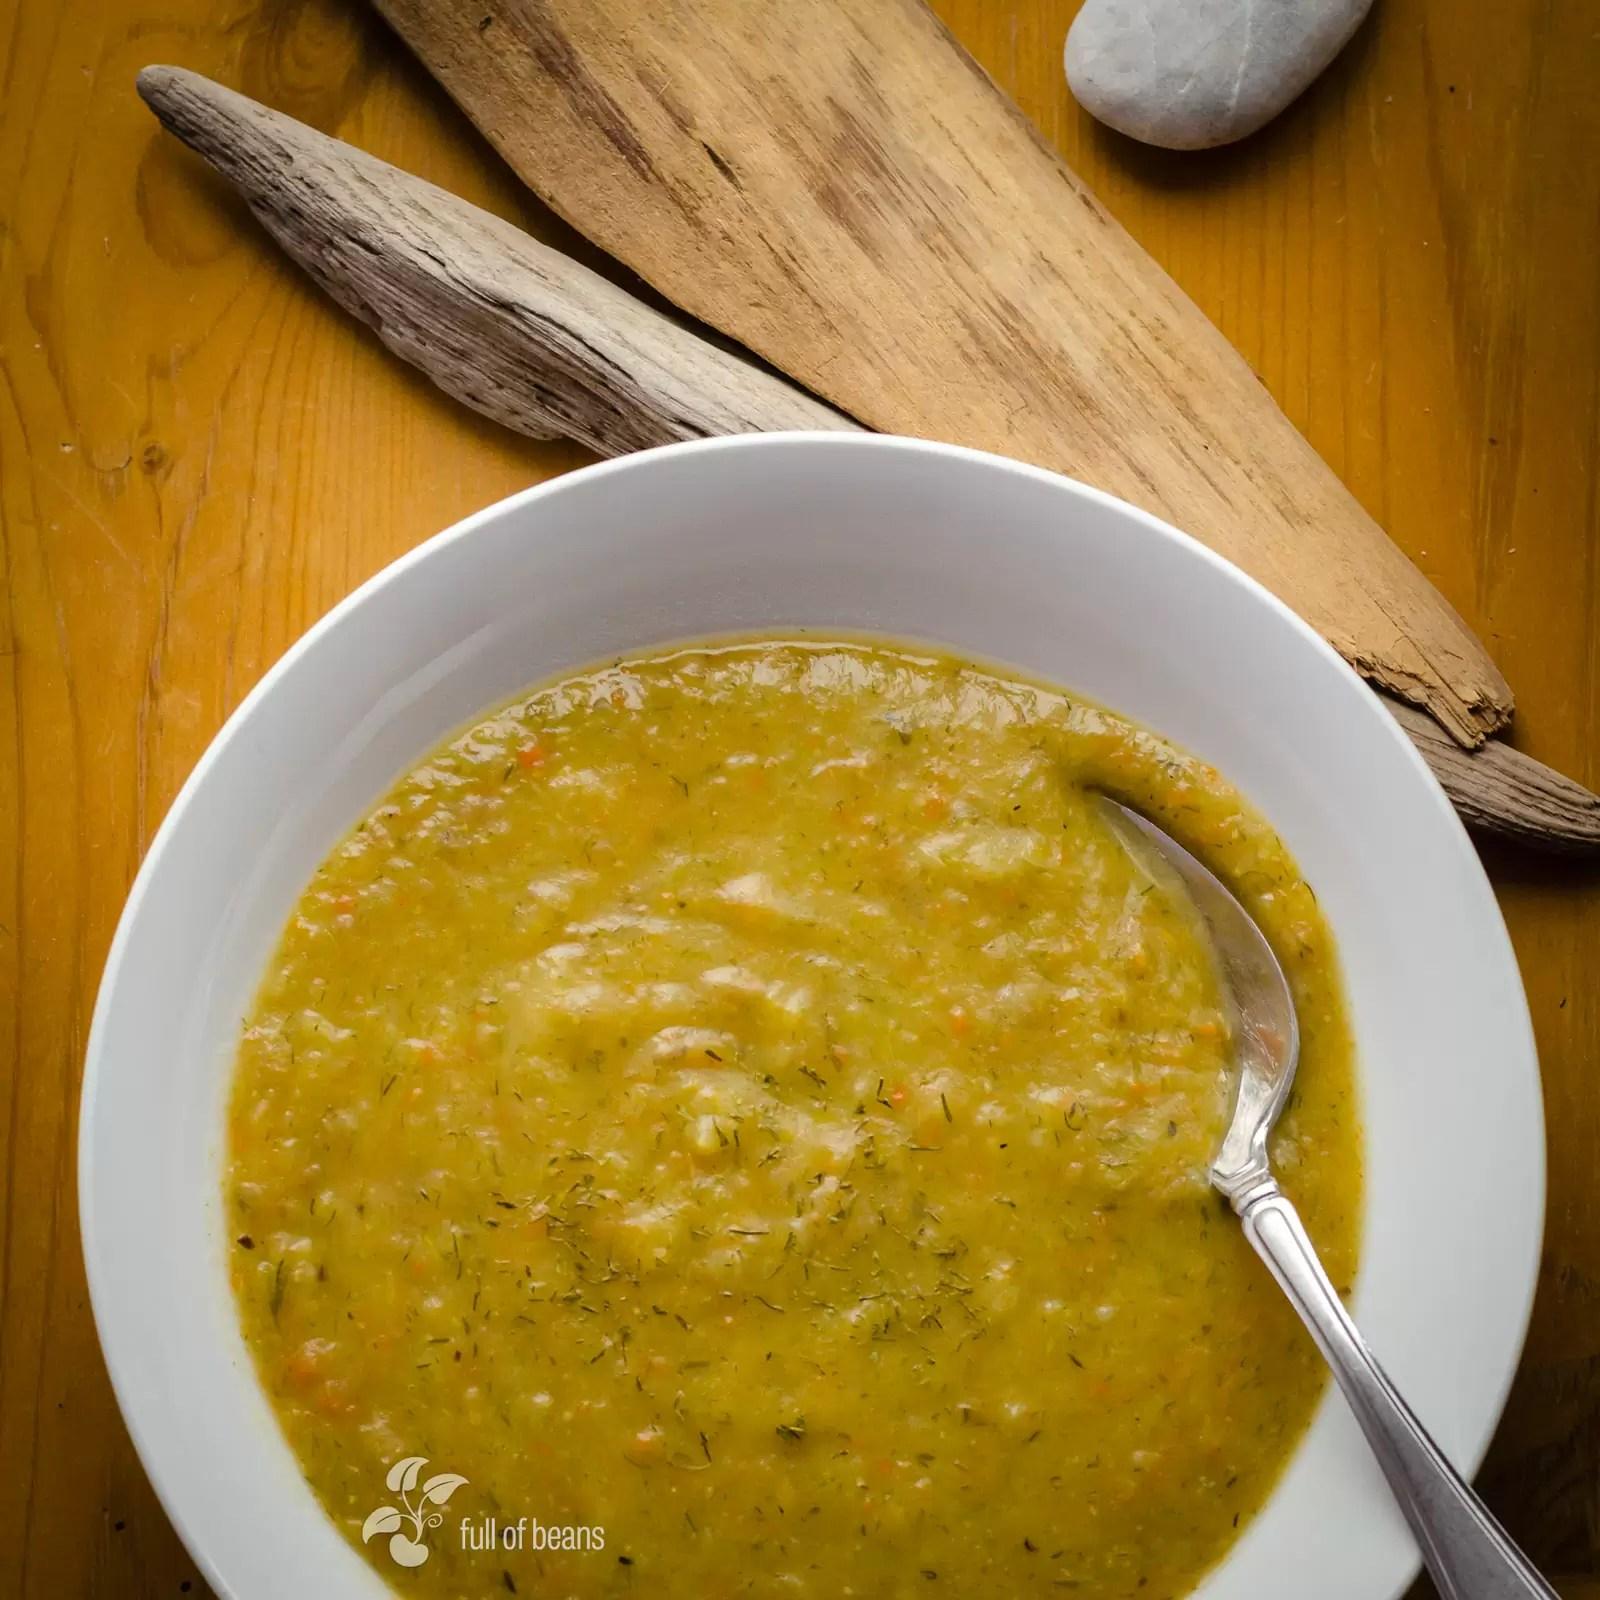 Vegan Leek Soup With Potatoes – Savory Comfort Food